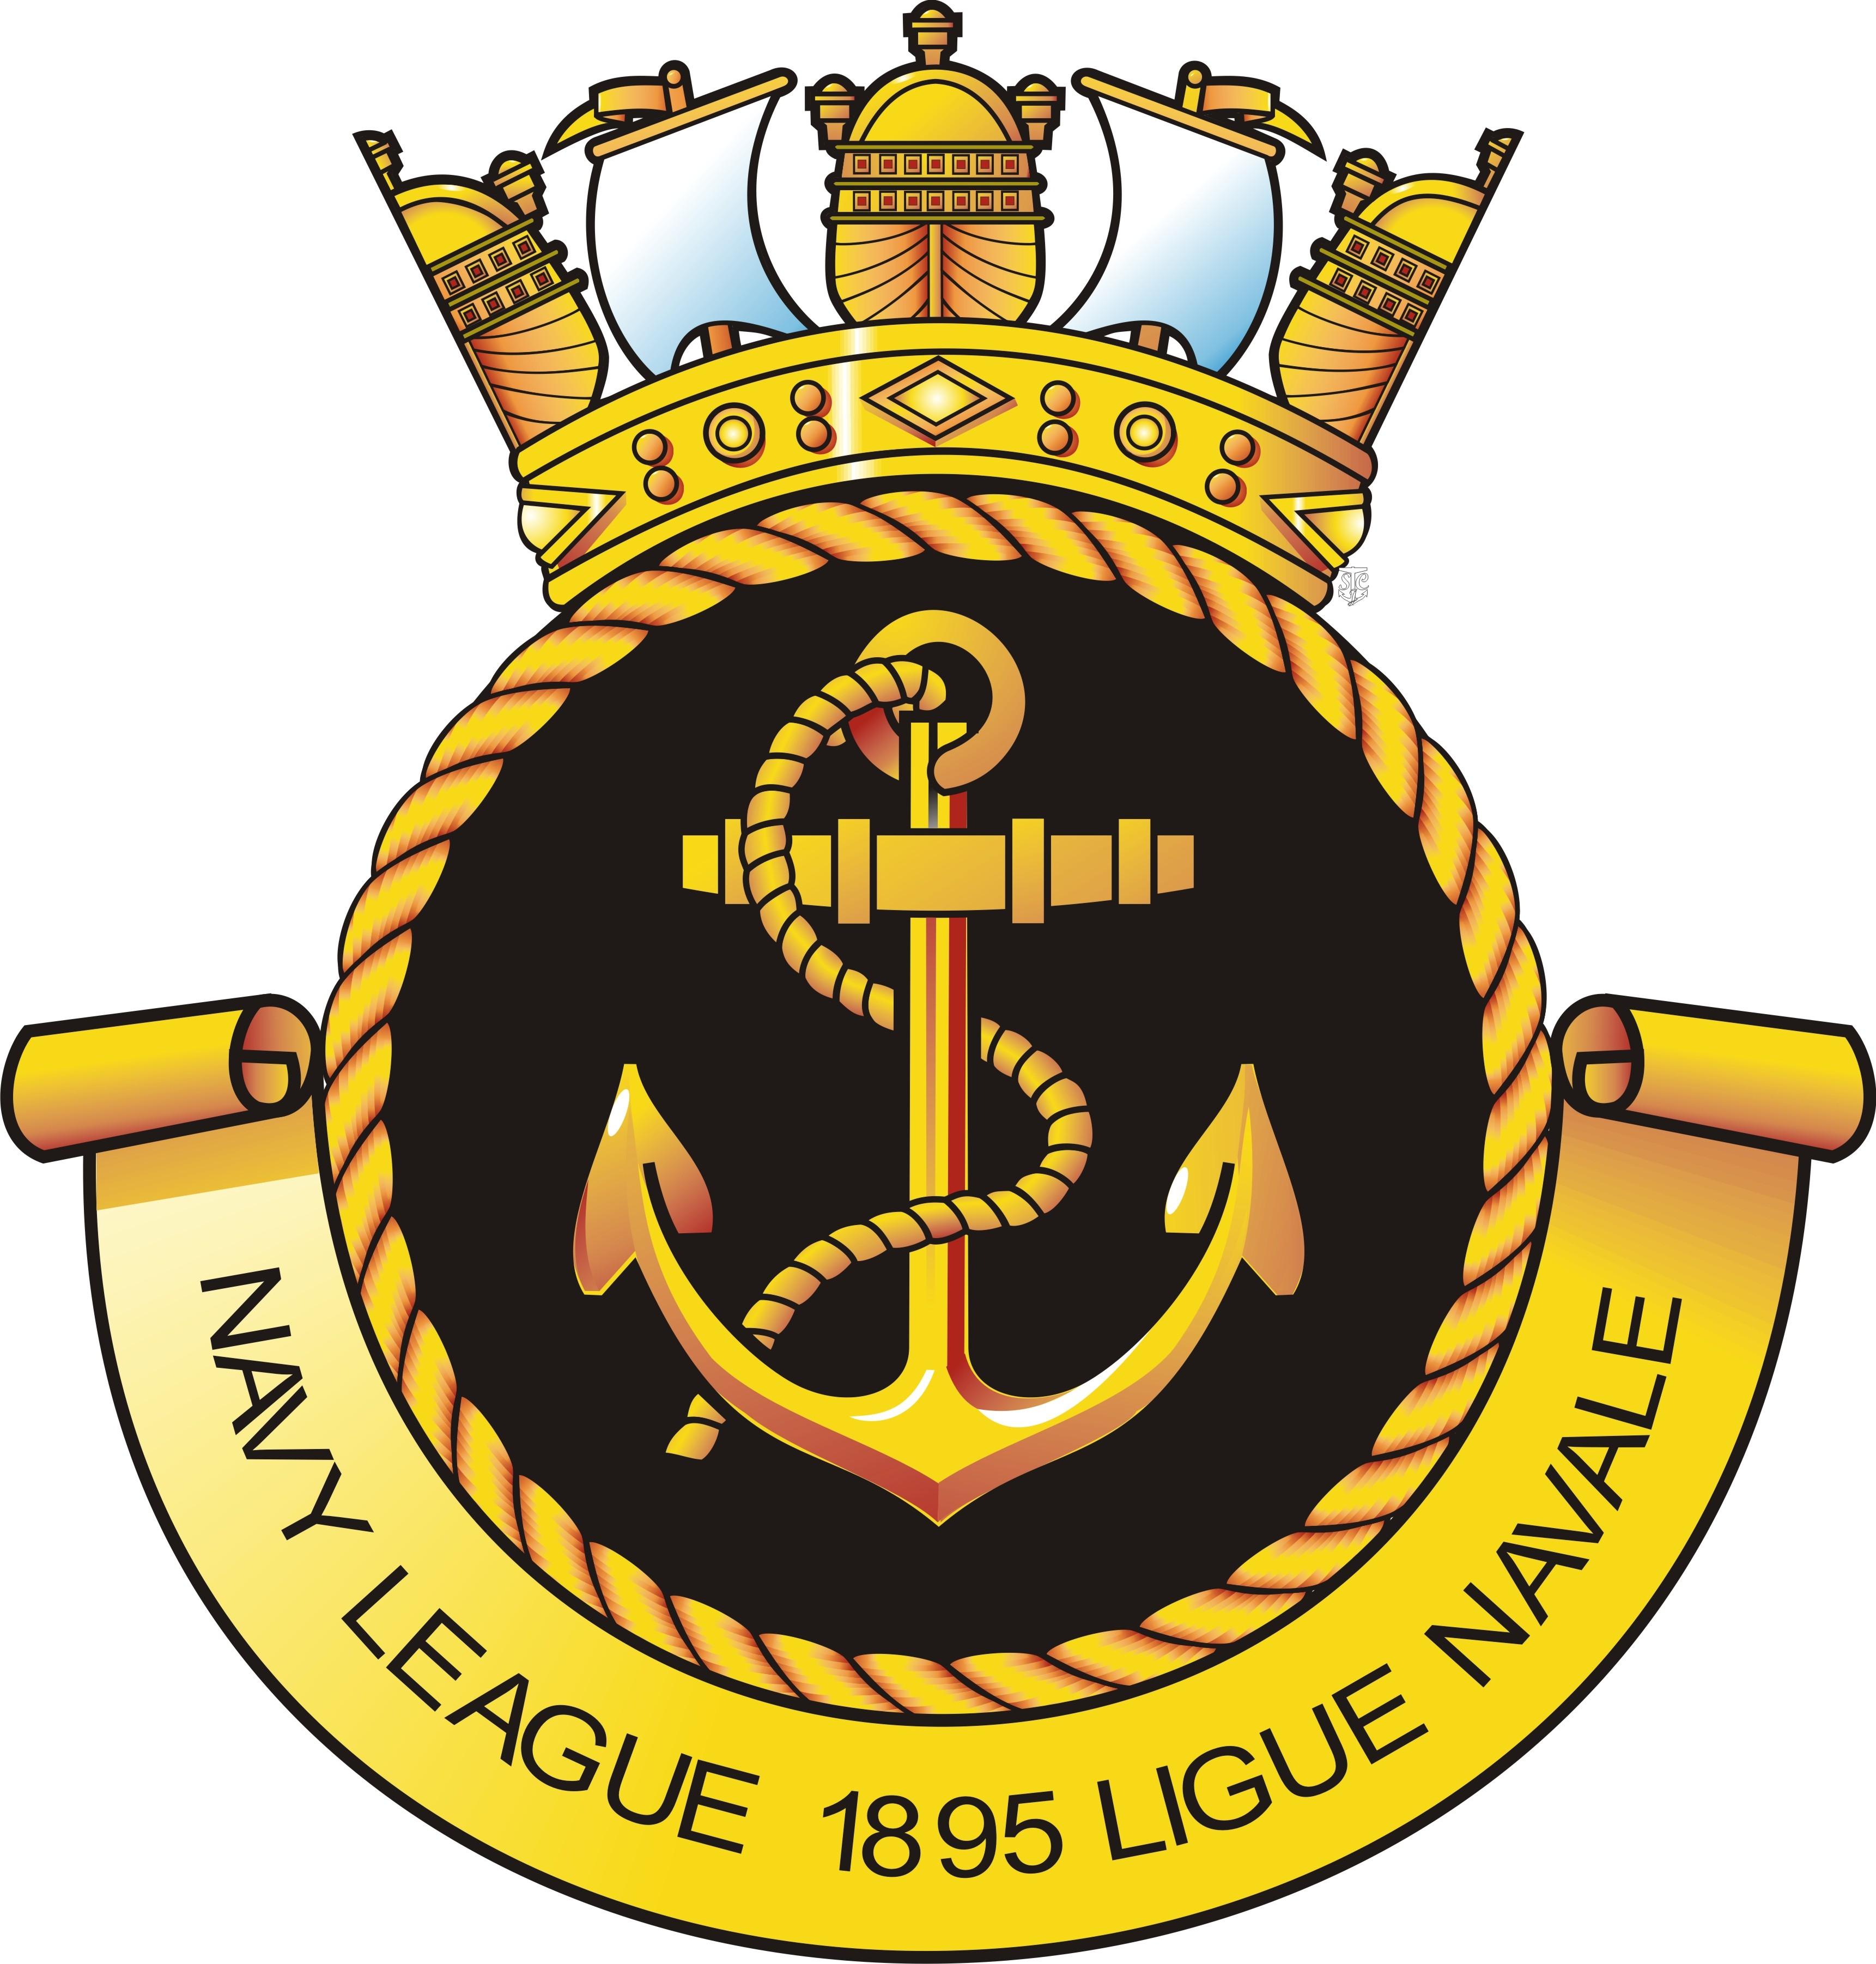 Clipart anchor navy canadian. League of canada brantford